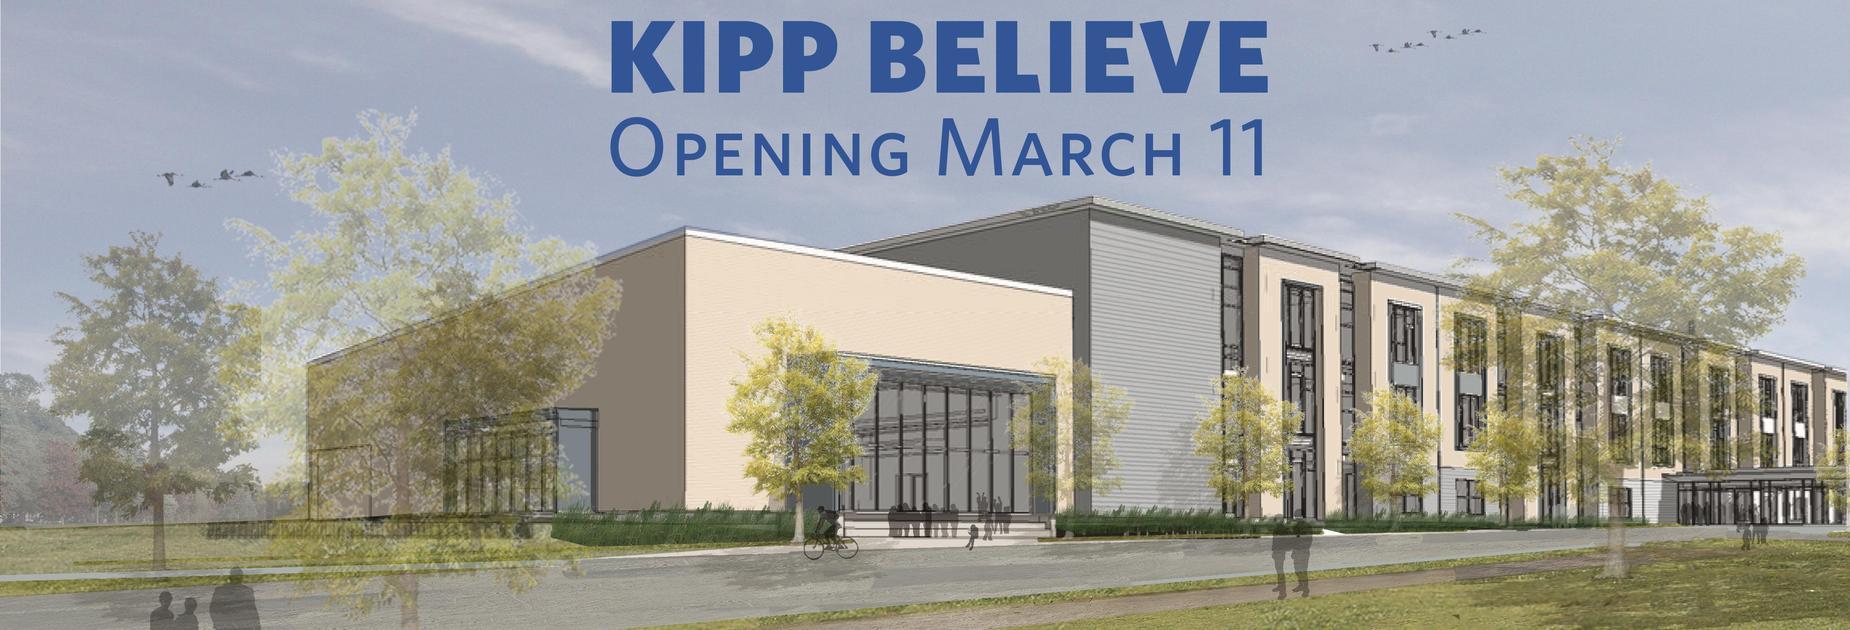 Rendering of the new KIPP Believe building opening March 11